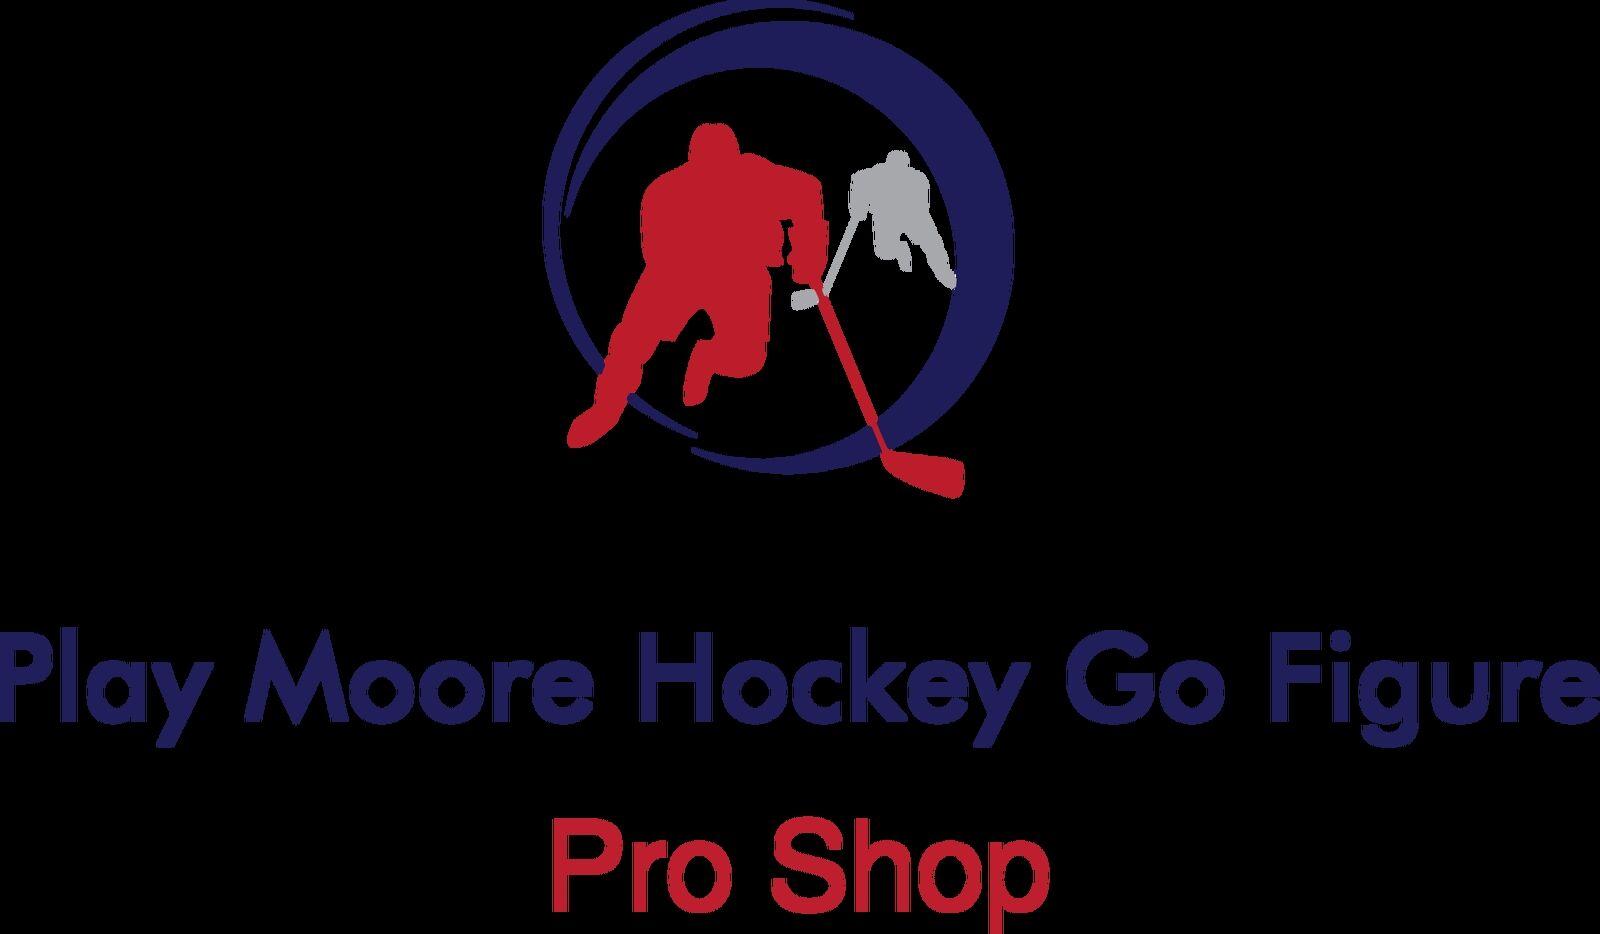 Moore Hockey